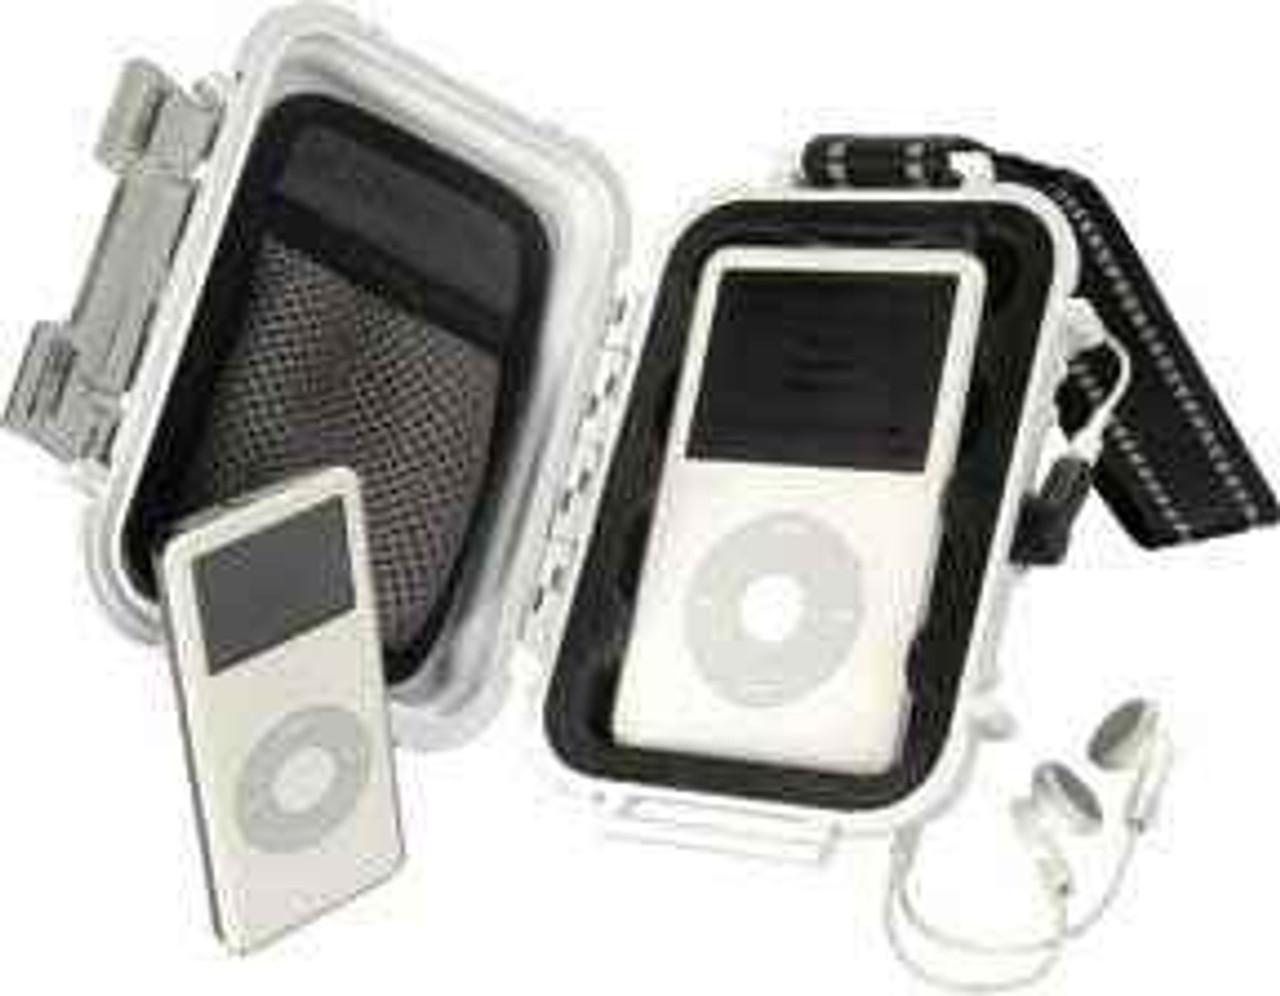 "Pelican iPod Case. White lid and body. Interior measurement 4.37"" x 2.87"" x 1.68"""